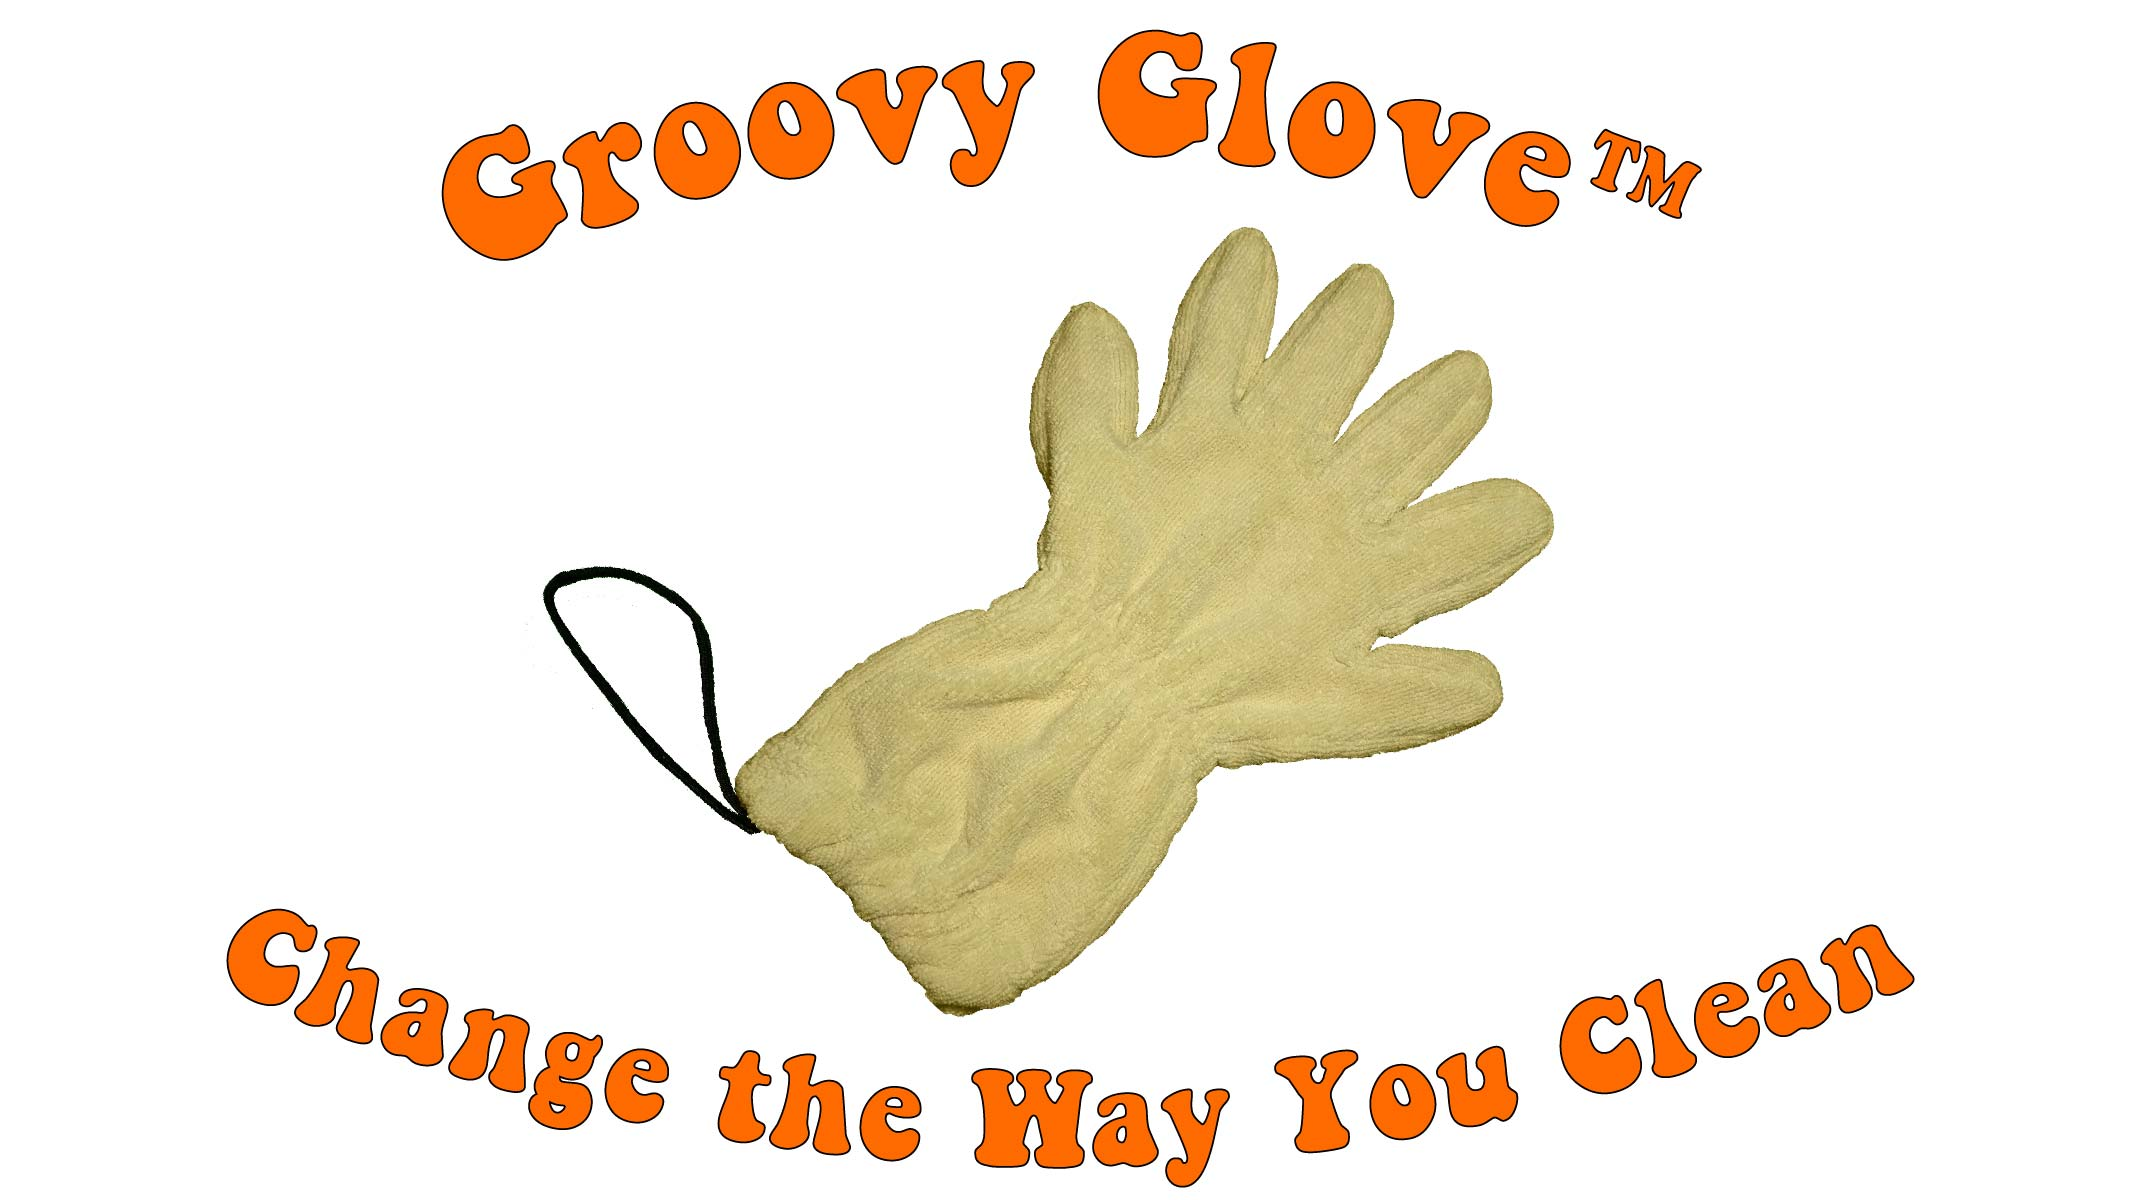 Groovy Glove